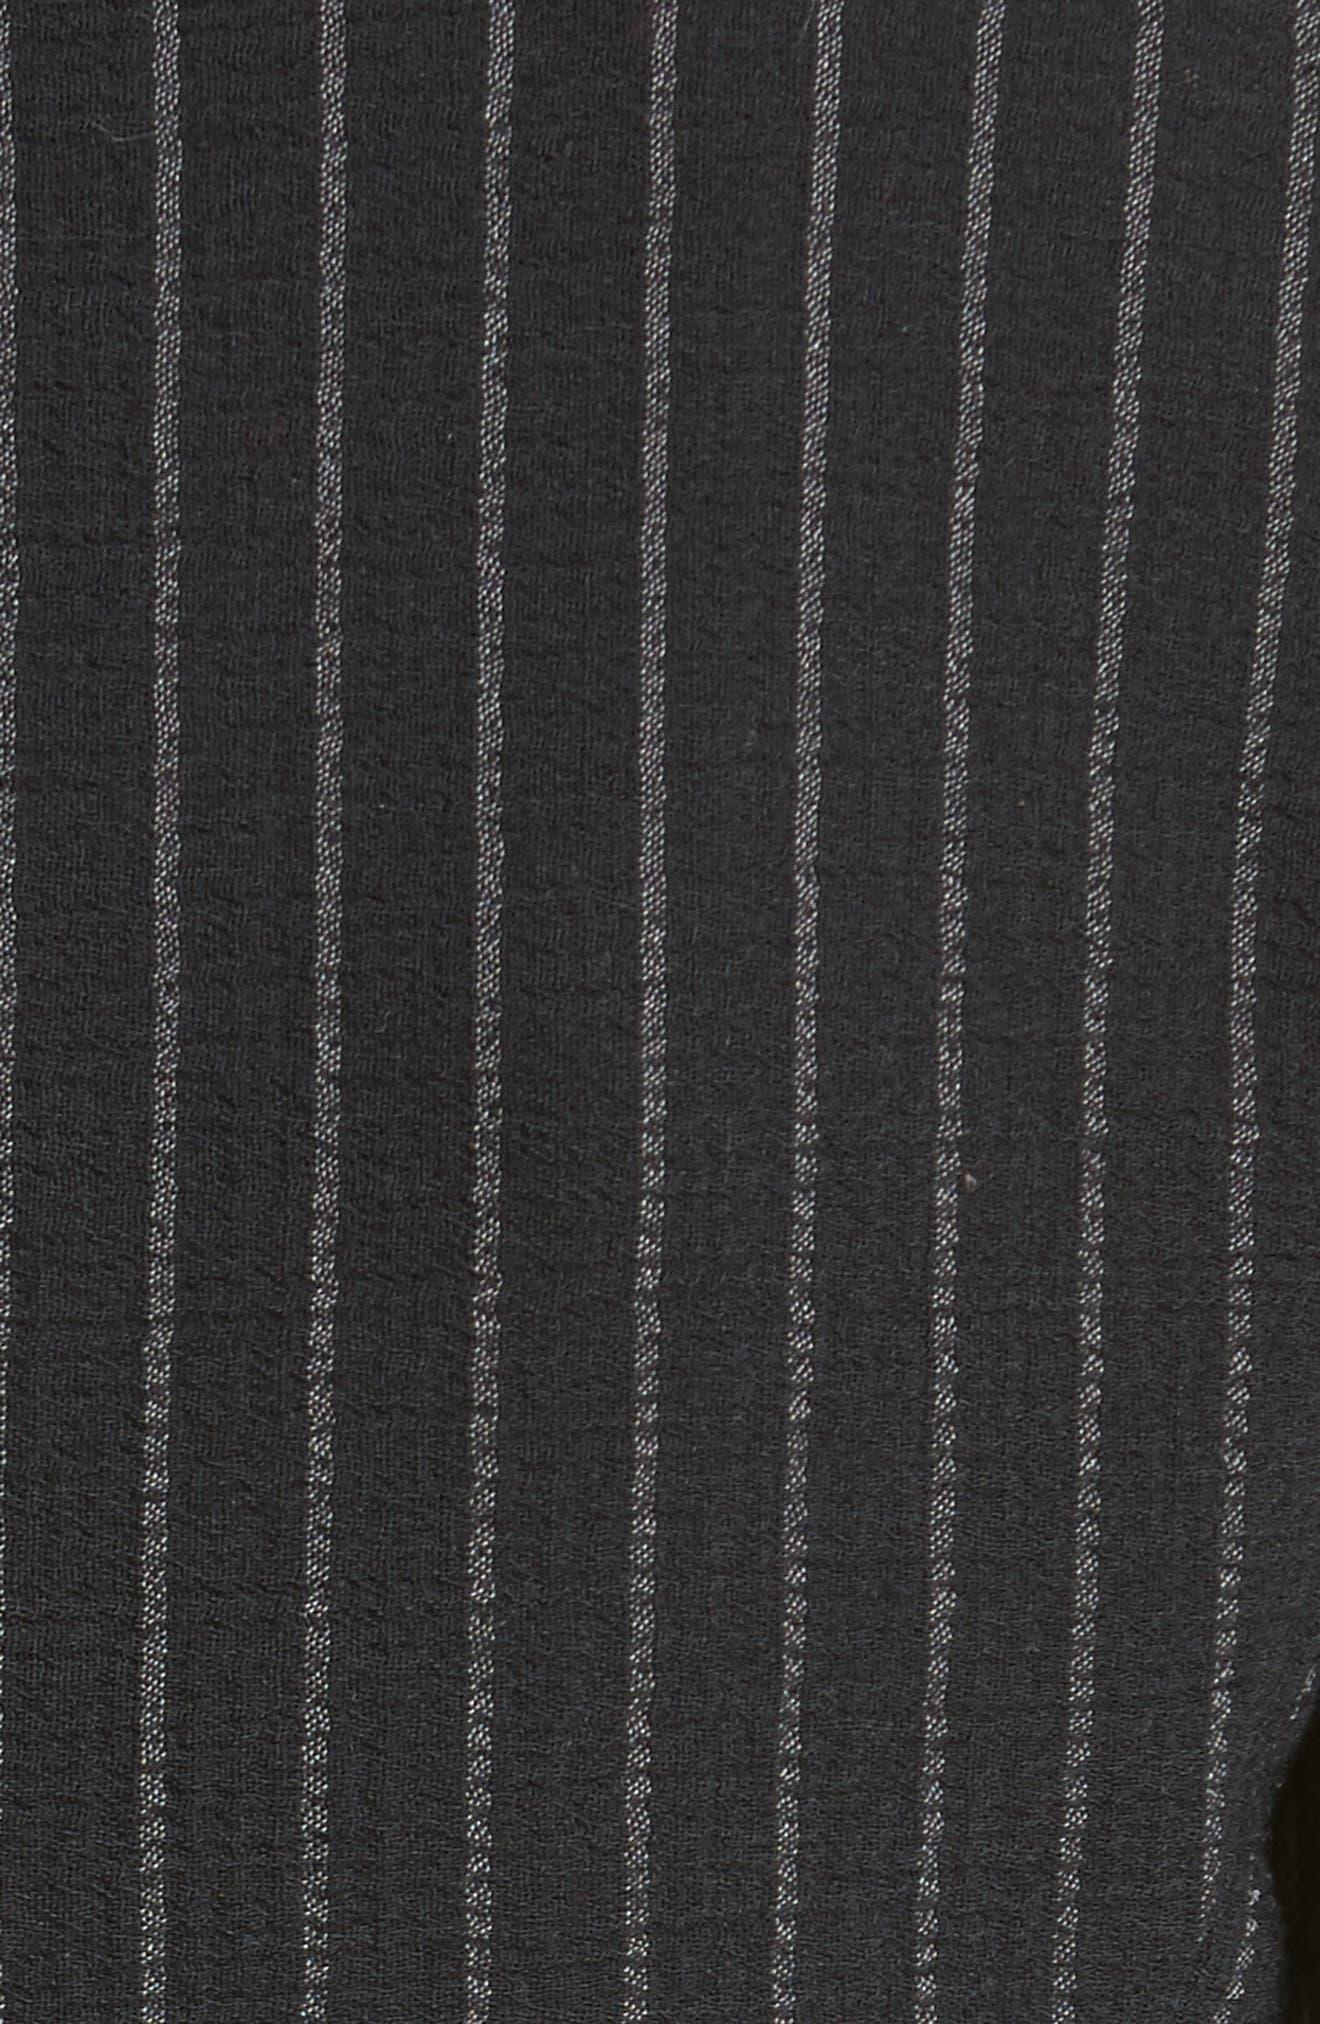 Stretch Wool Pinstripe Jacket,                             Alternate thumbnail 6, color,                             001